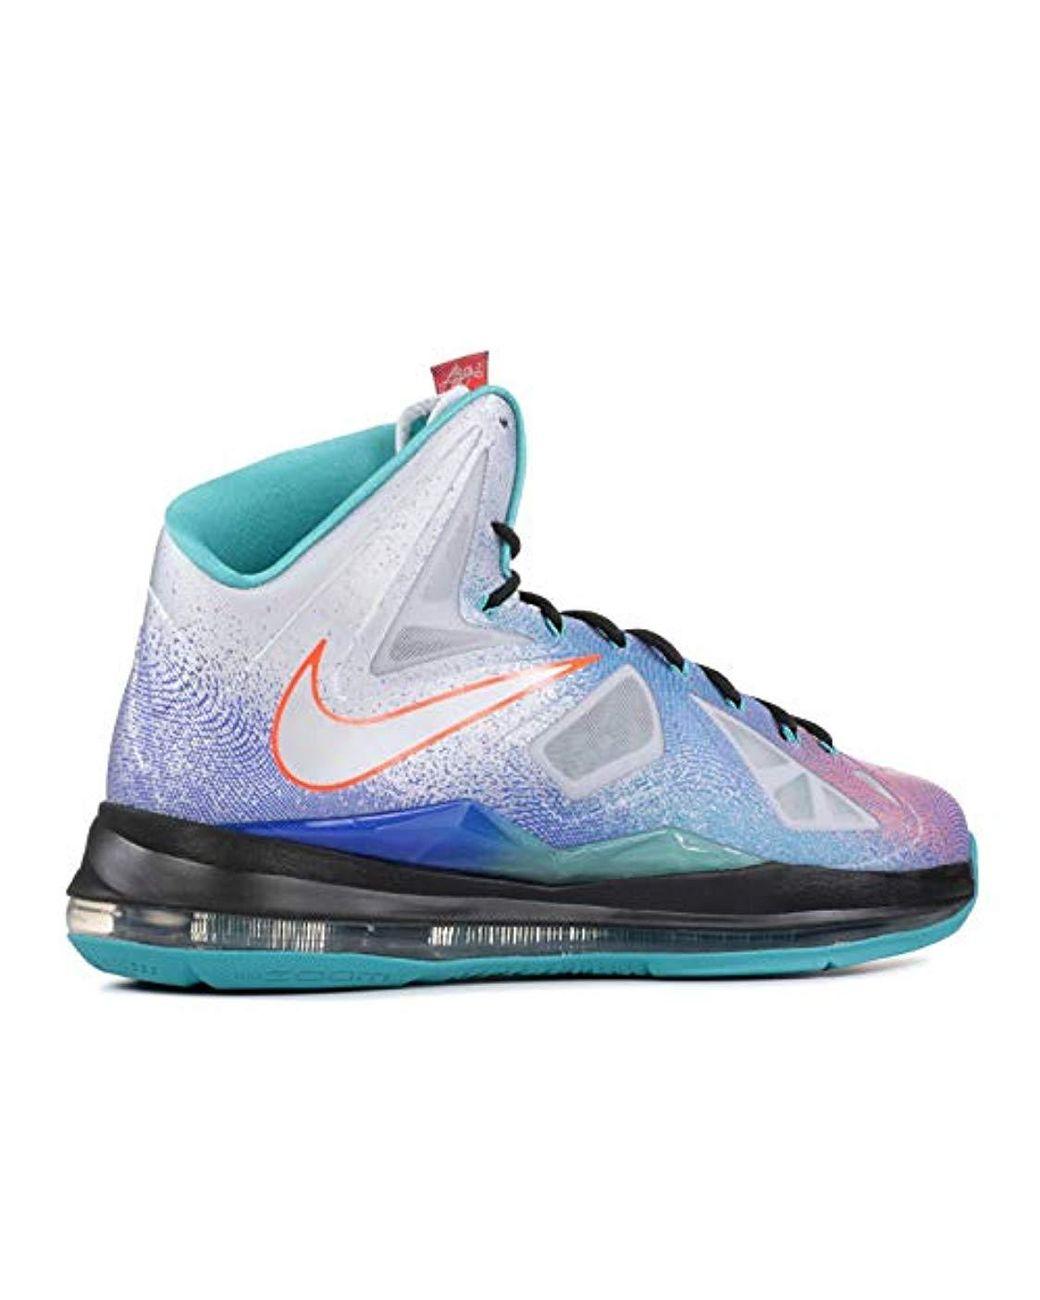 122b72306bffb Nike Lebron X S Hi Top Basketball Trainers 541100 Sneakers Shoes ...